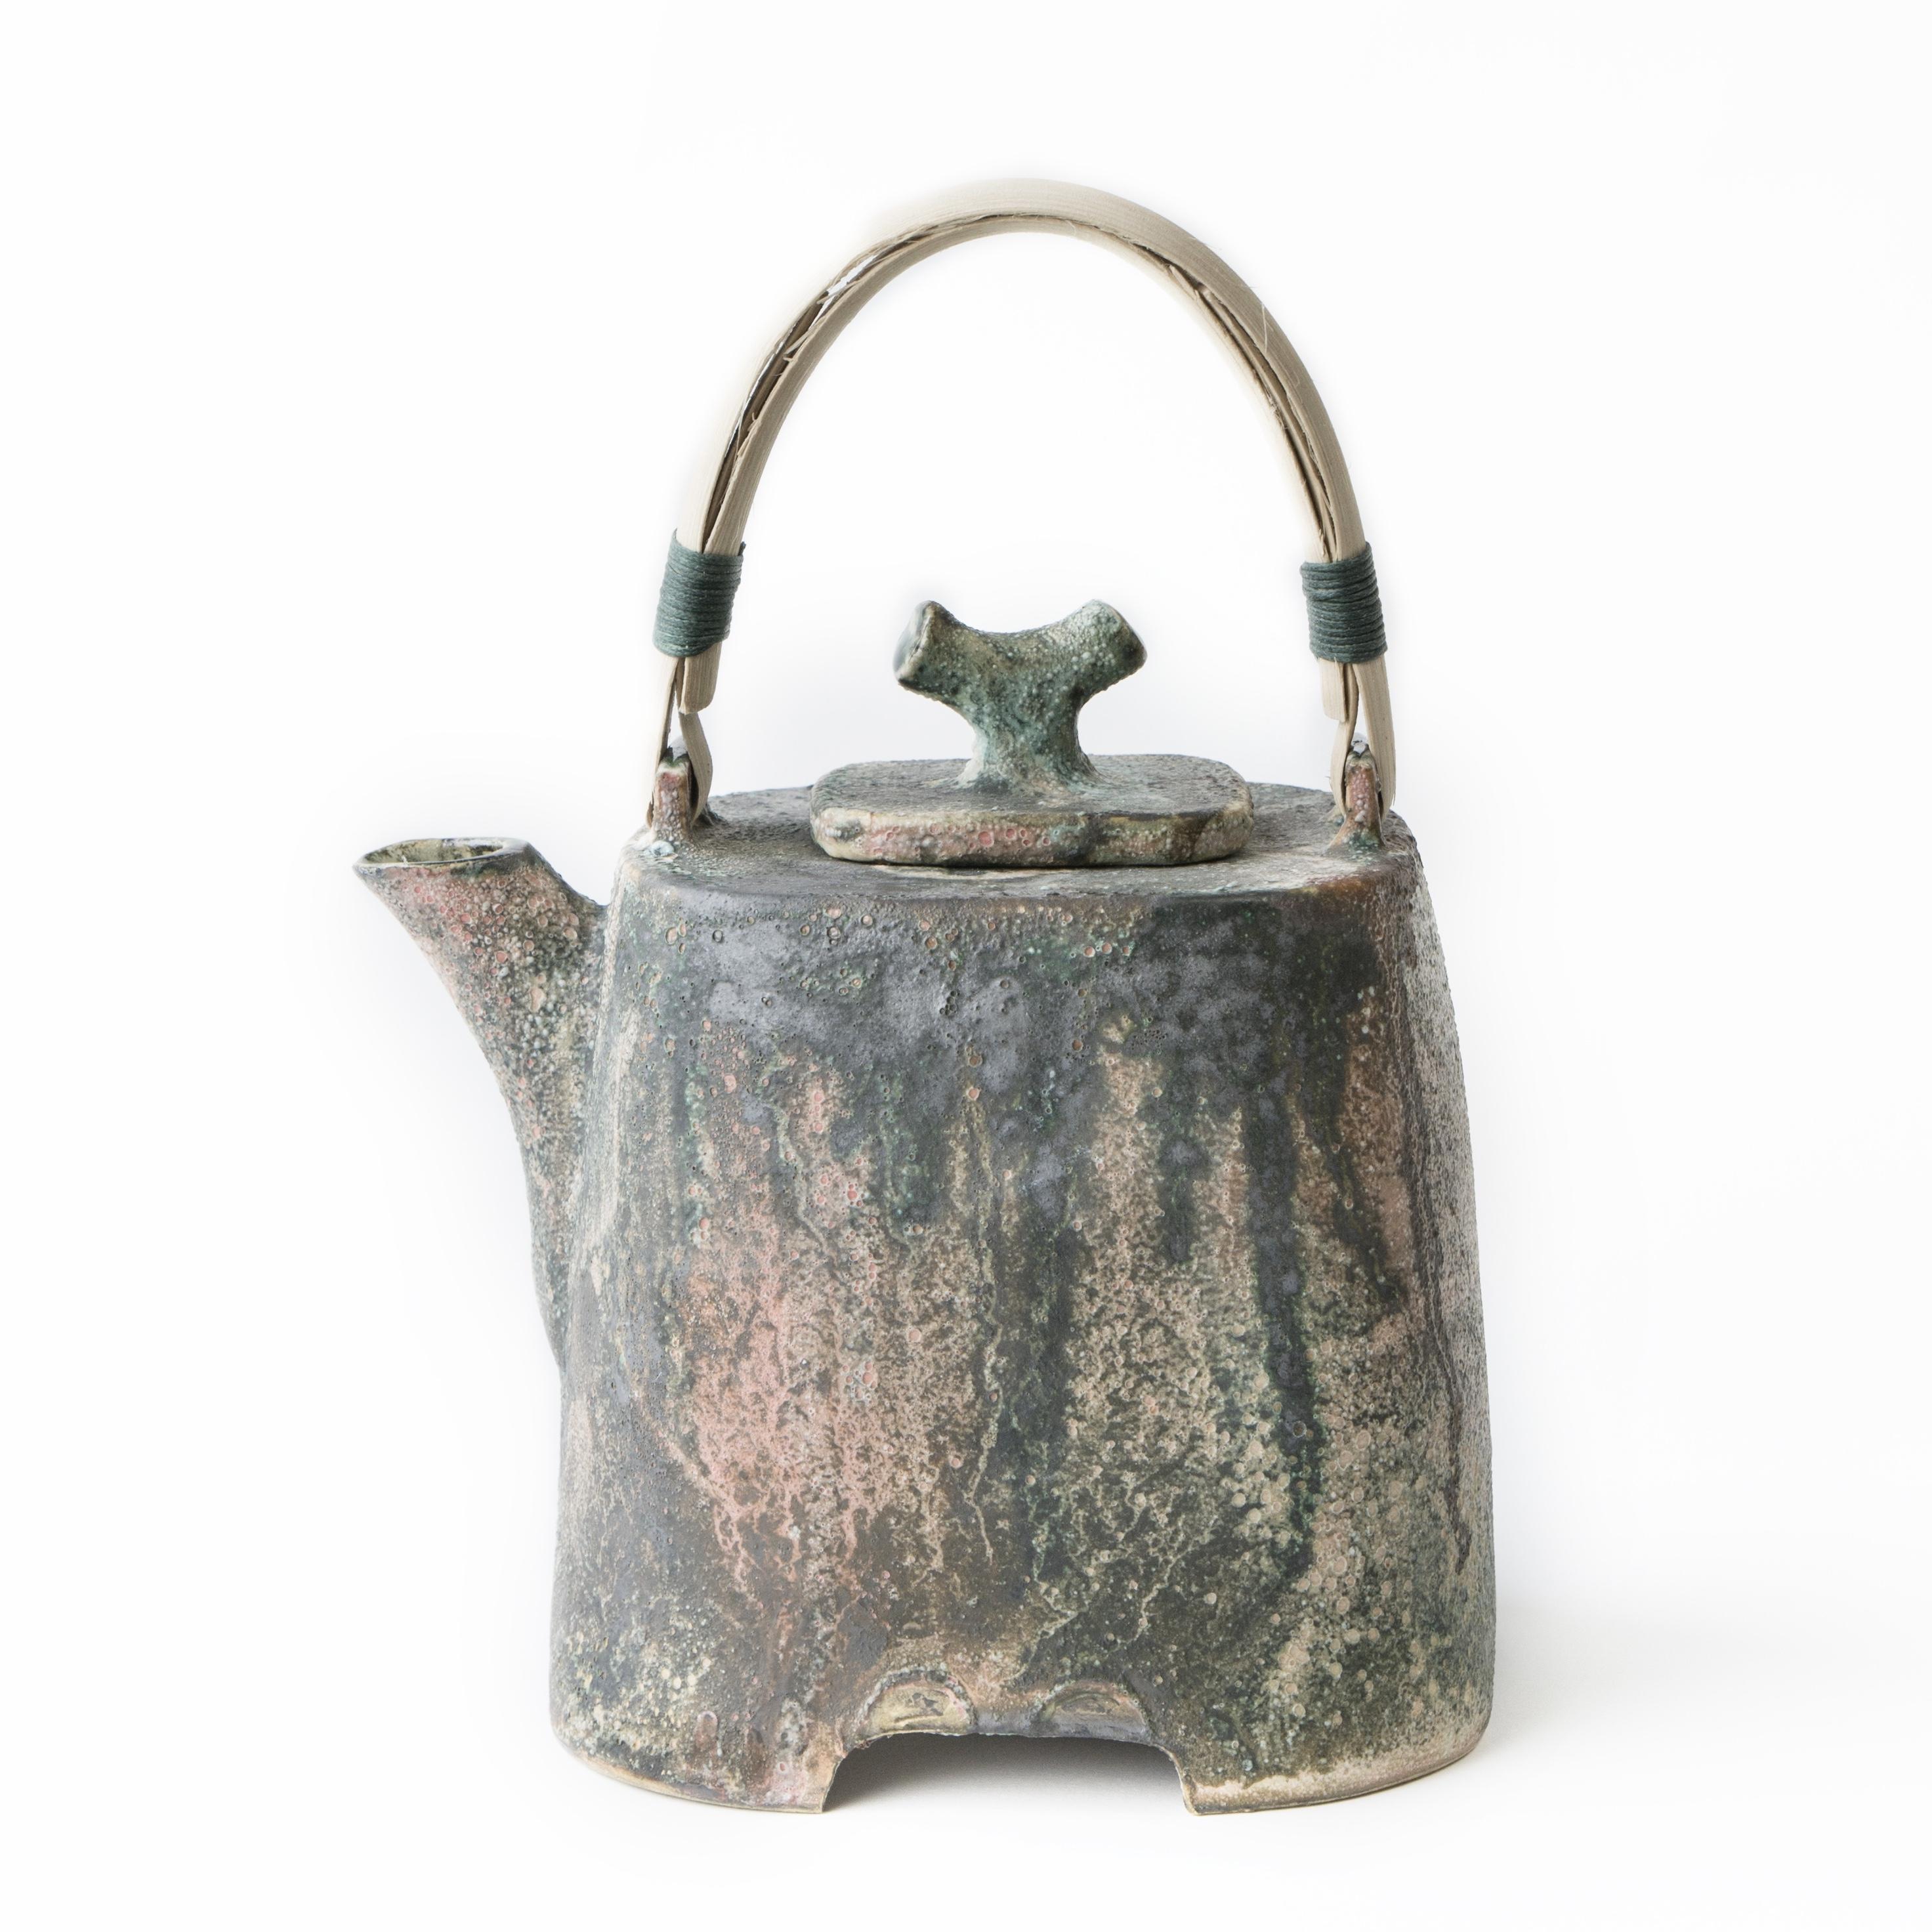 teapot o,8 liter